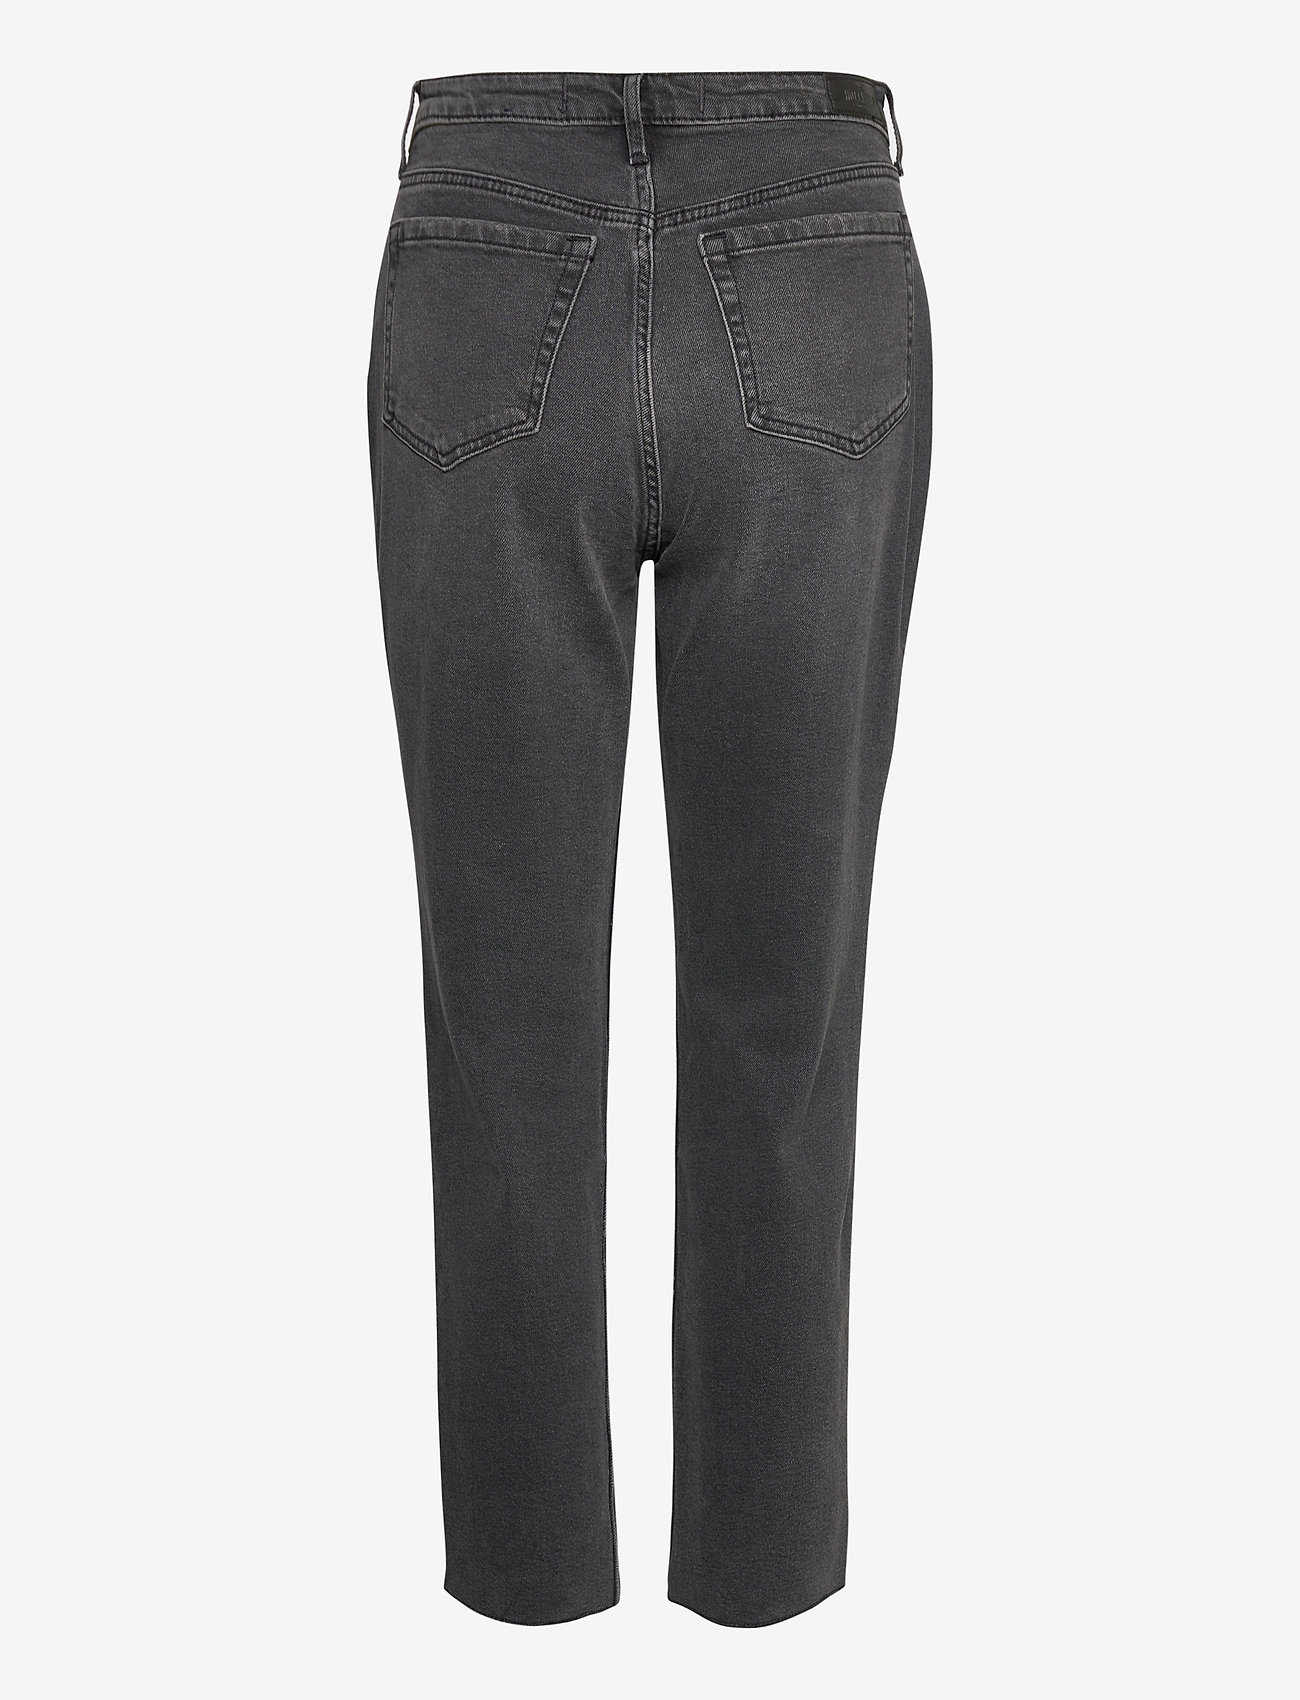 Hollister - UHR MOM - straight jeans - washed black - 1